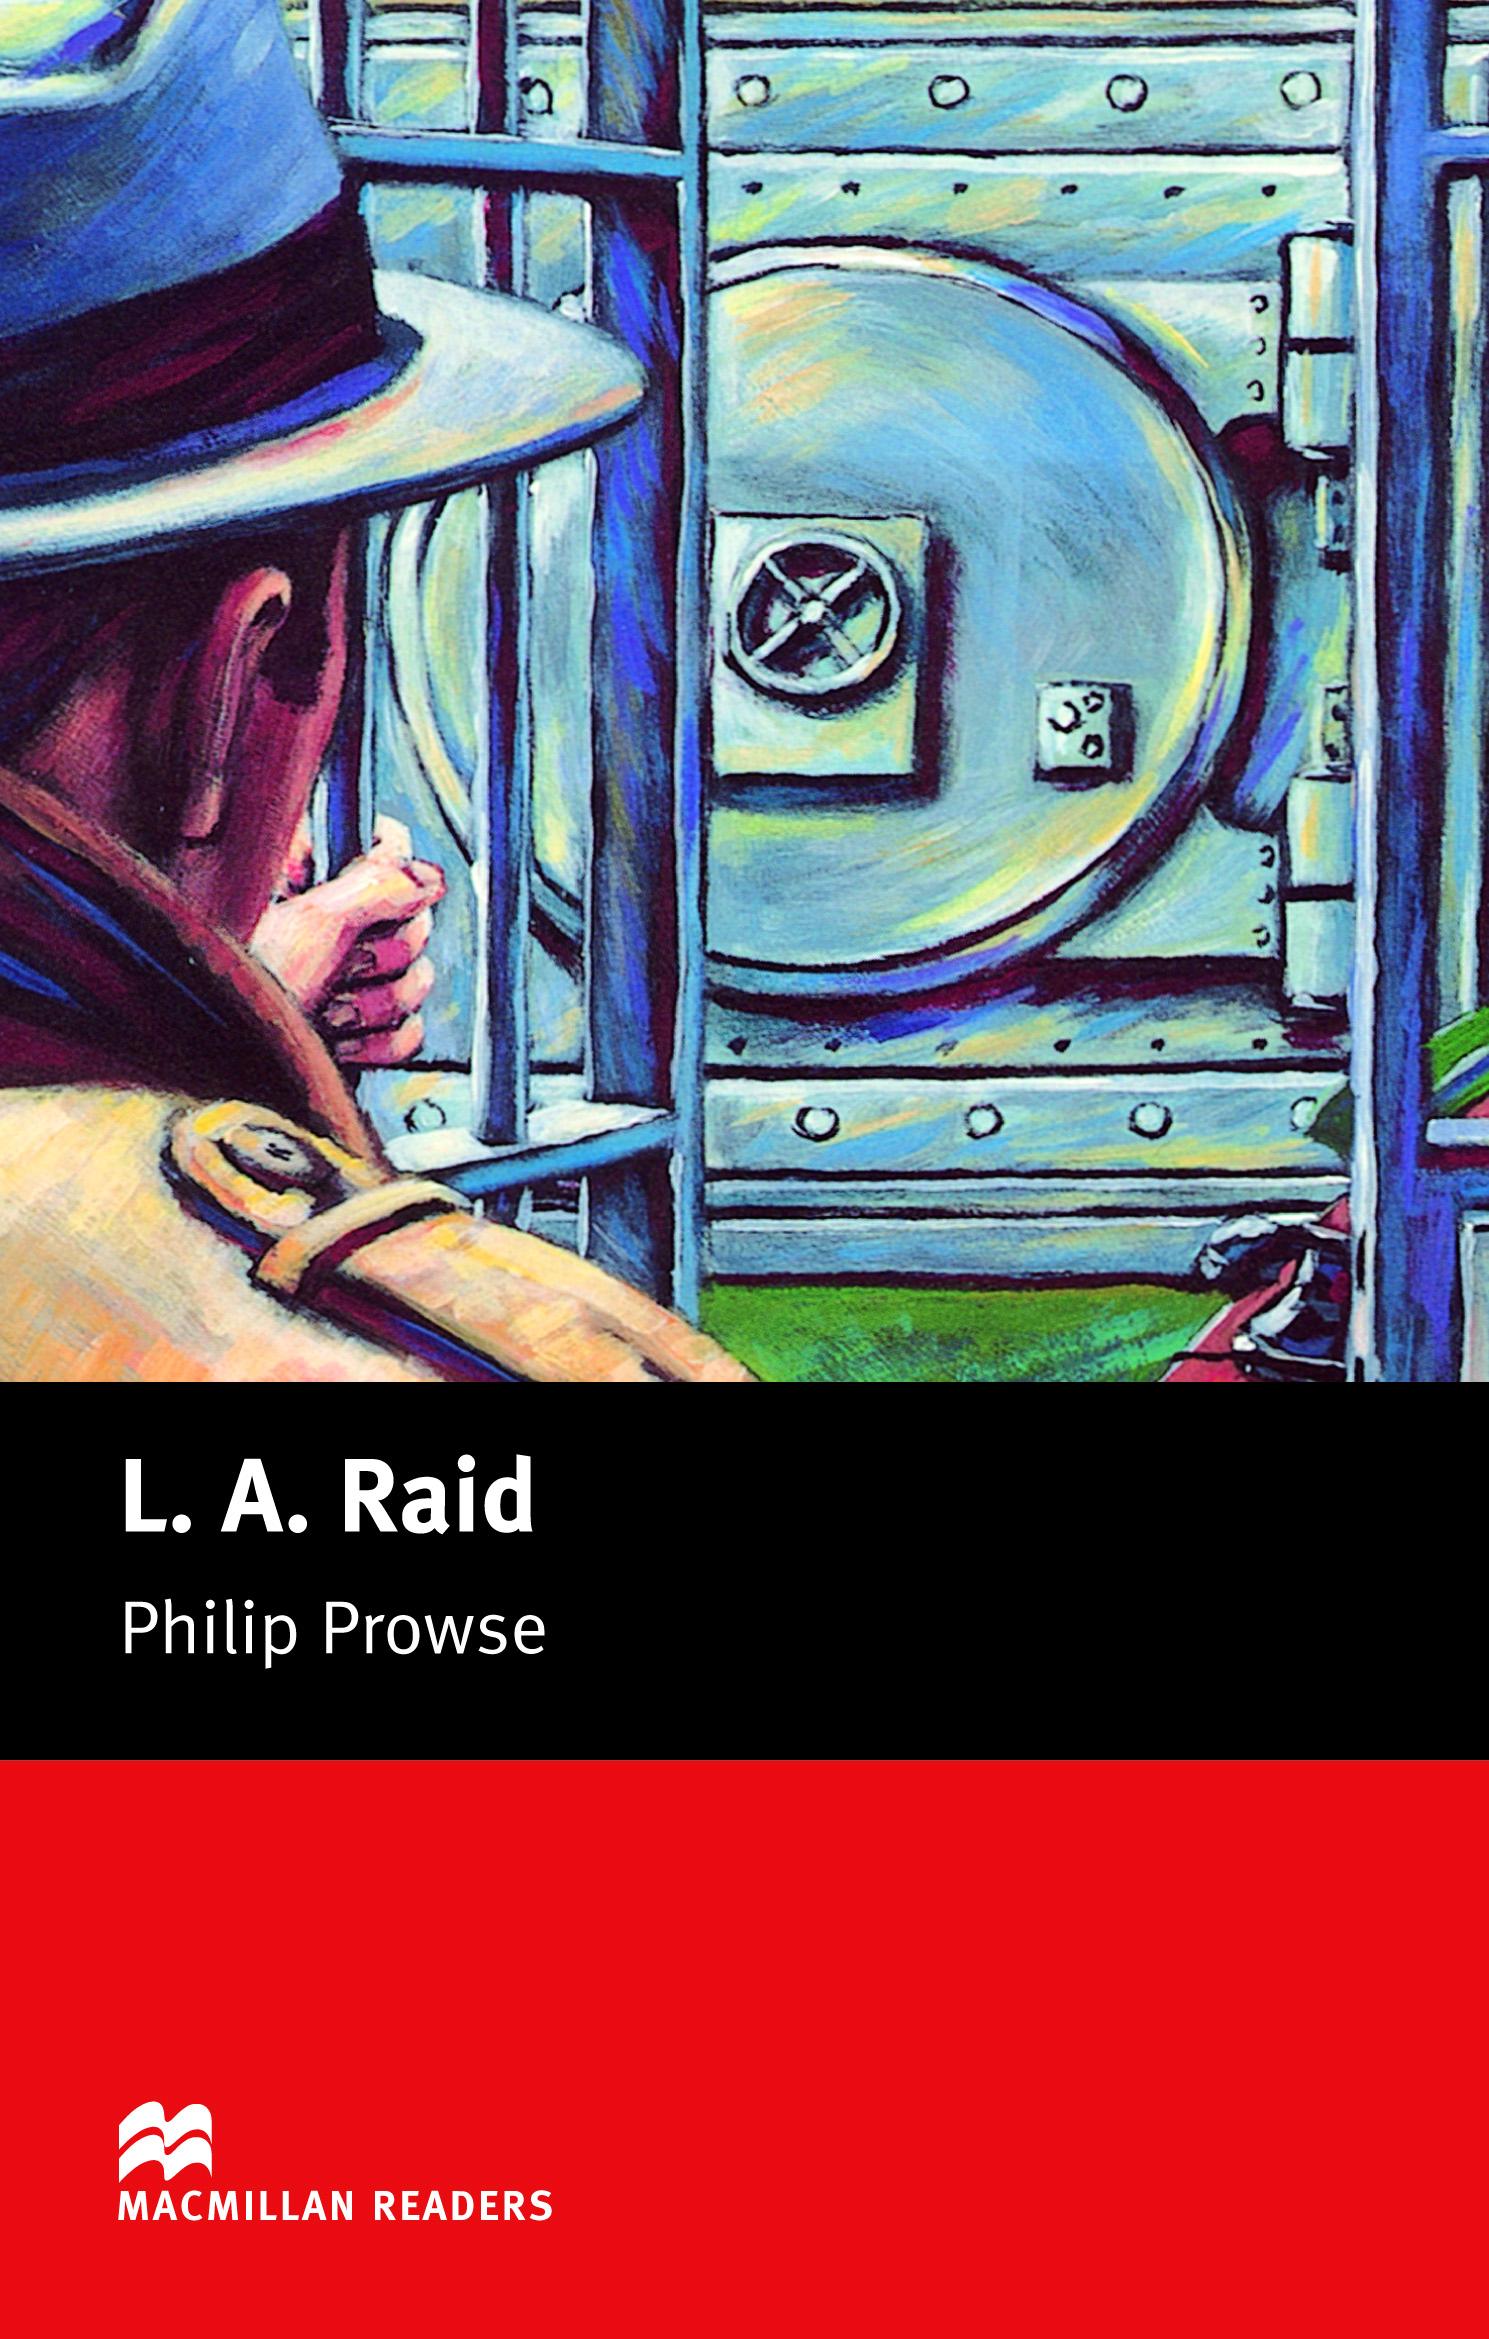 Macmillan Readers: L.A. Raid